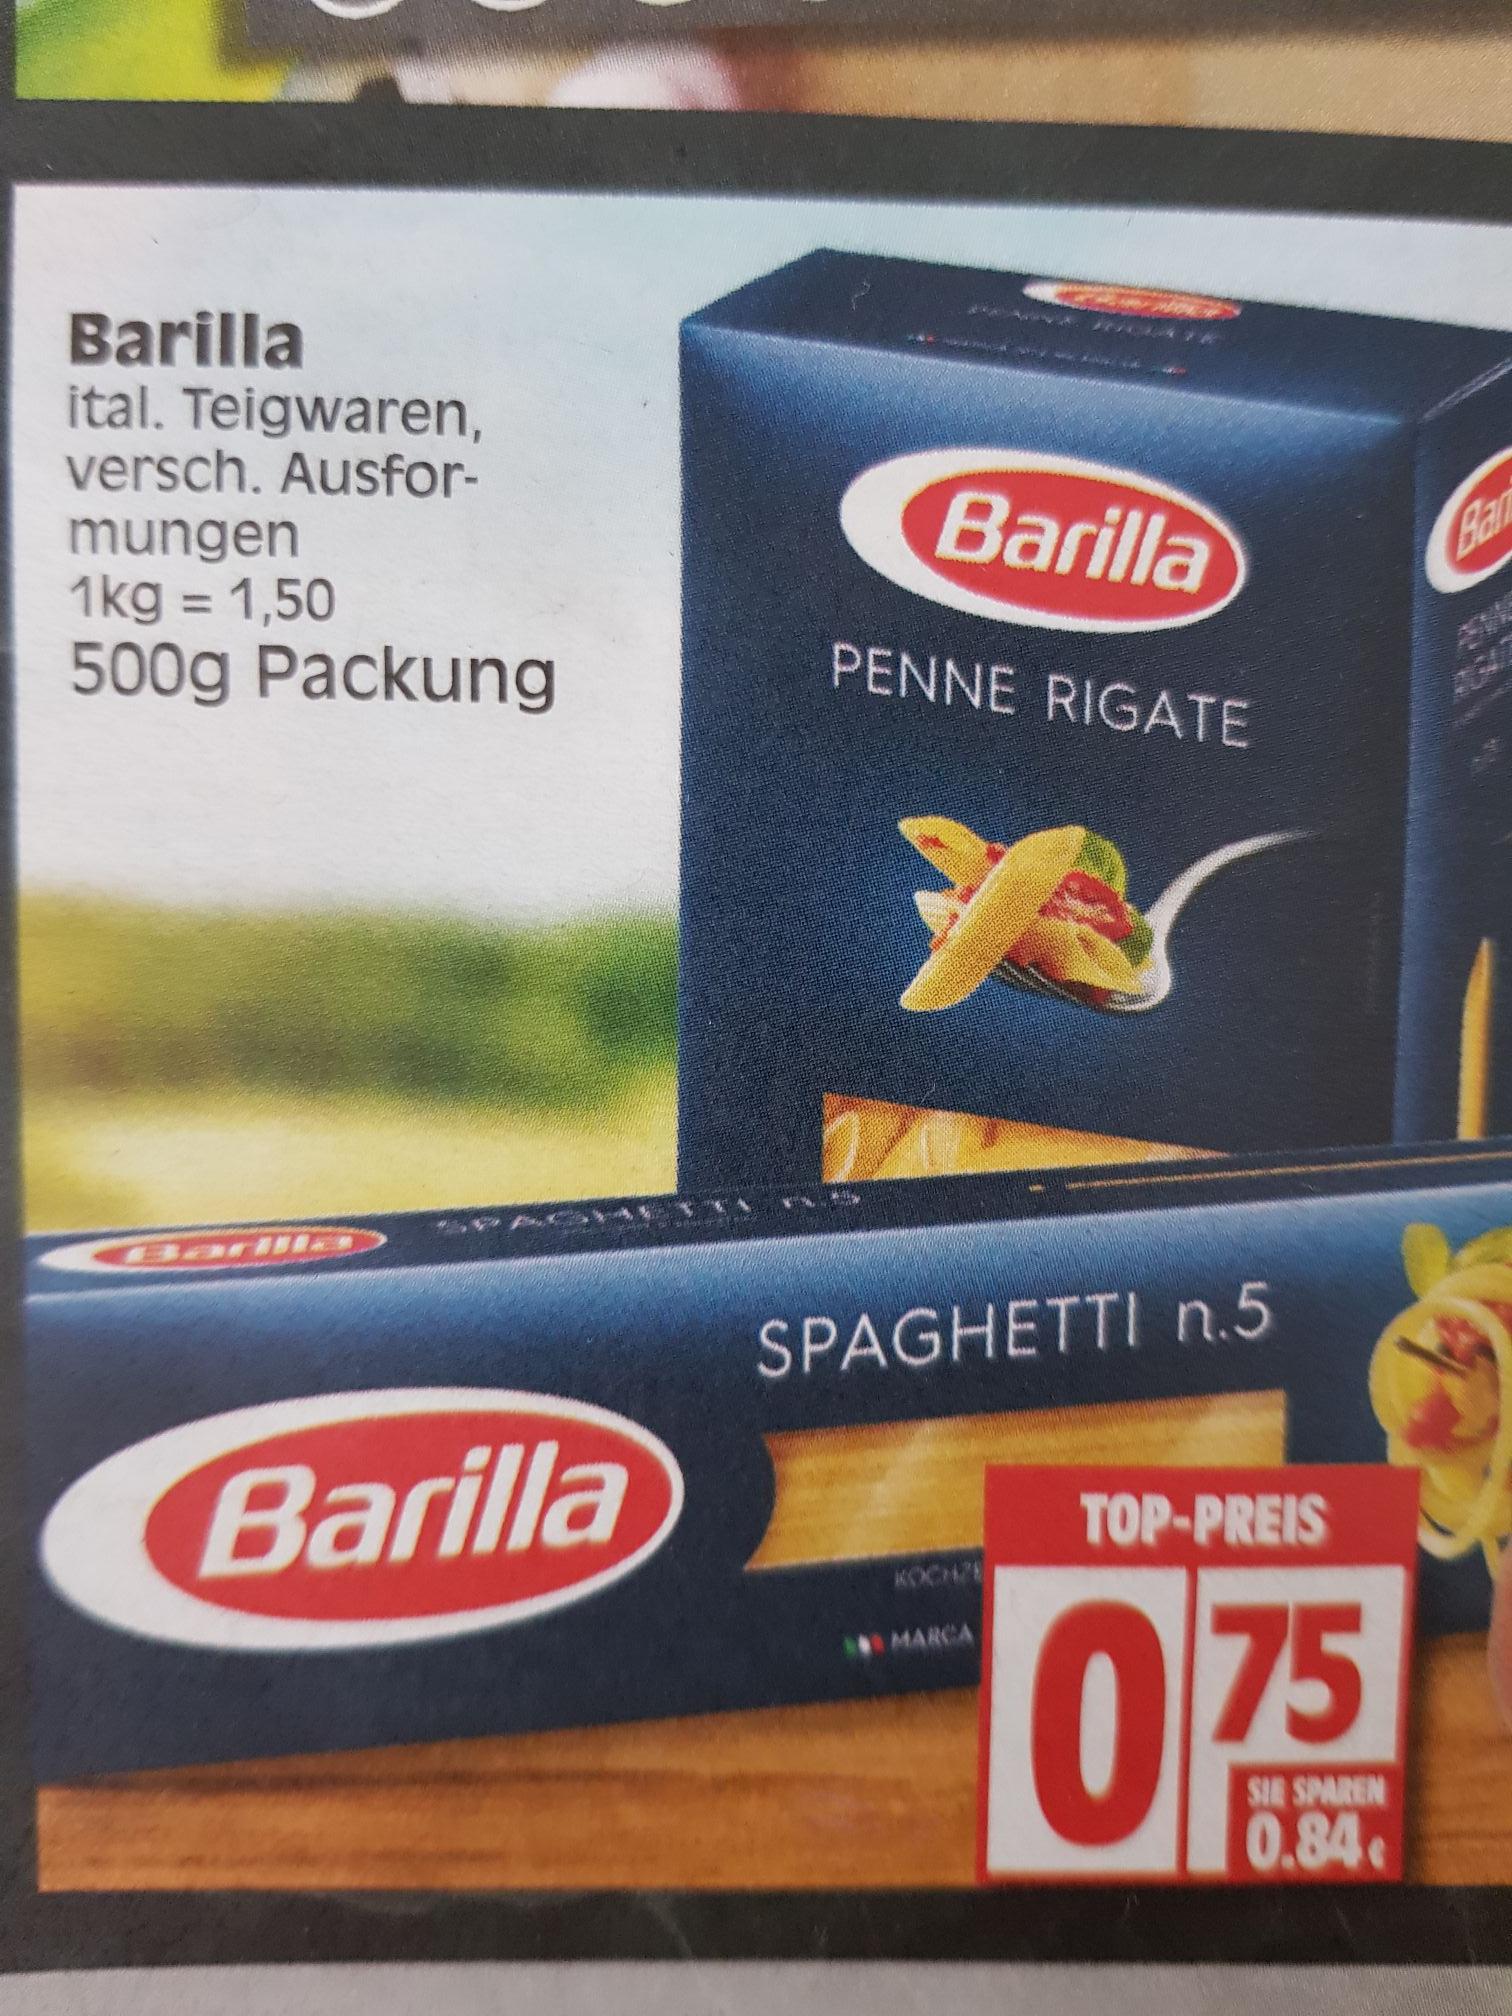 [EDEKA] Barilla verschiedene Sorten je 0.75€ pro 500g